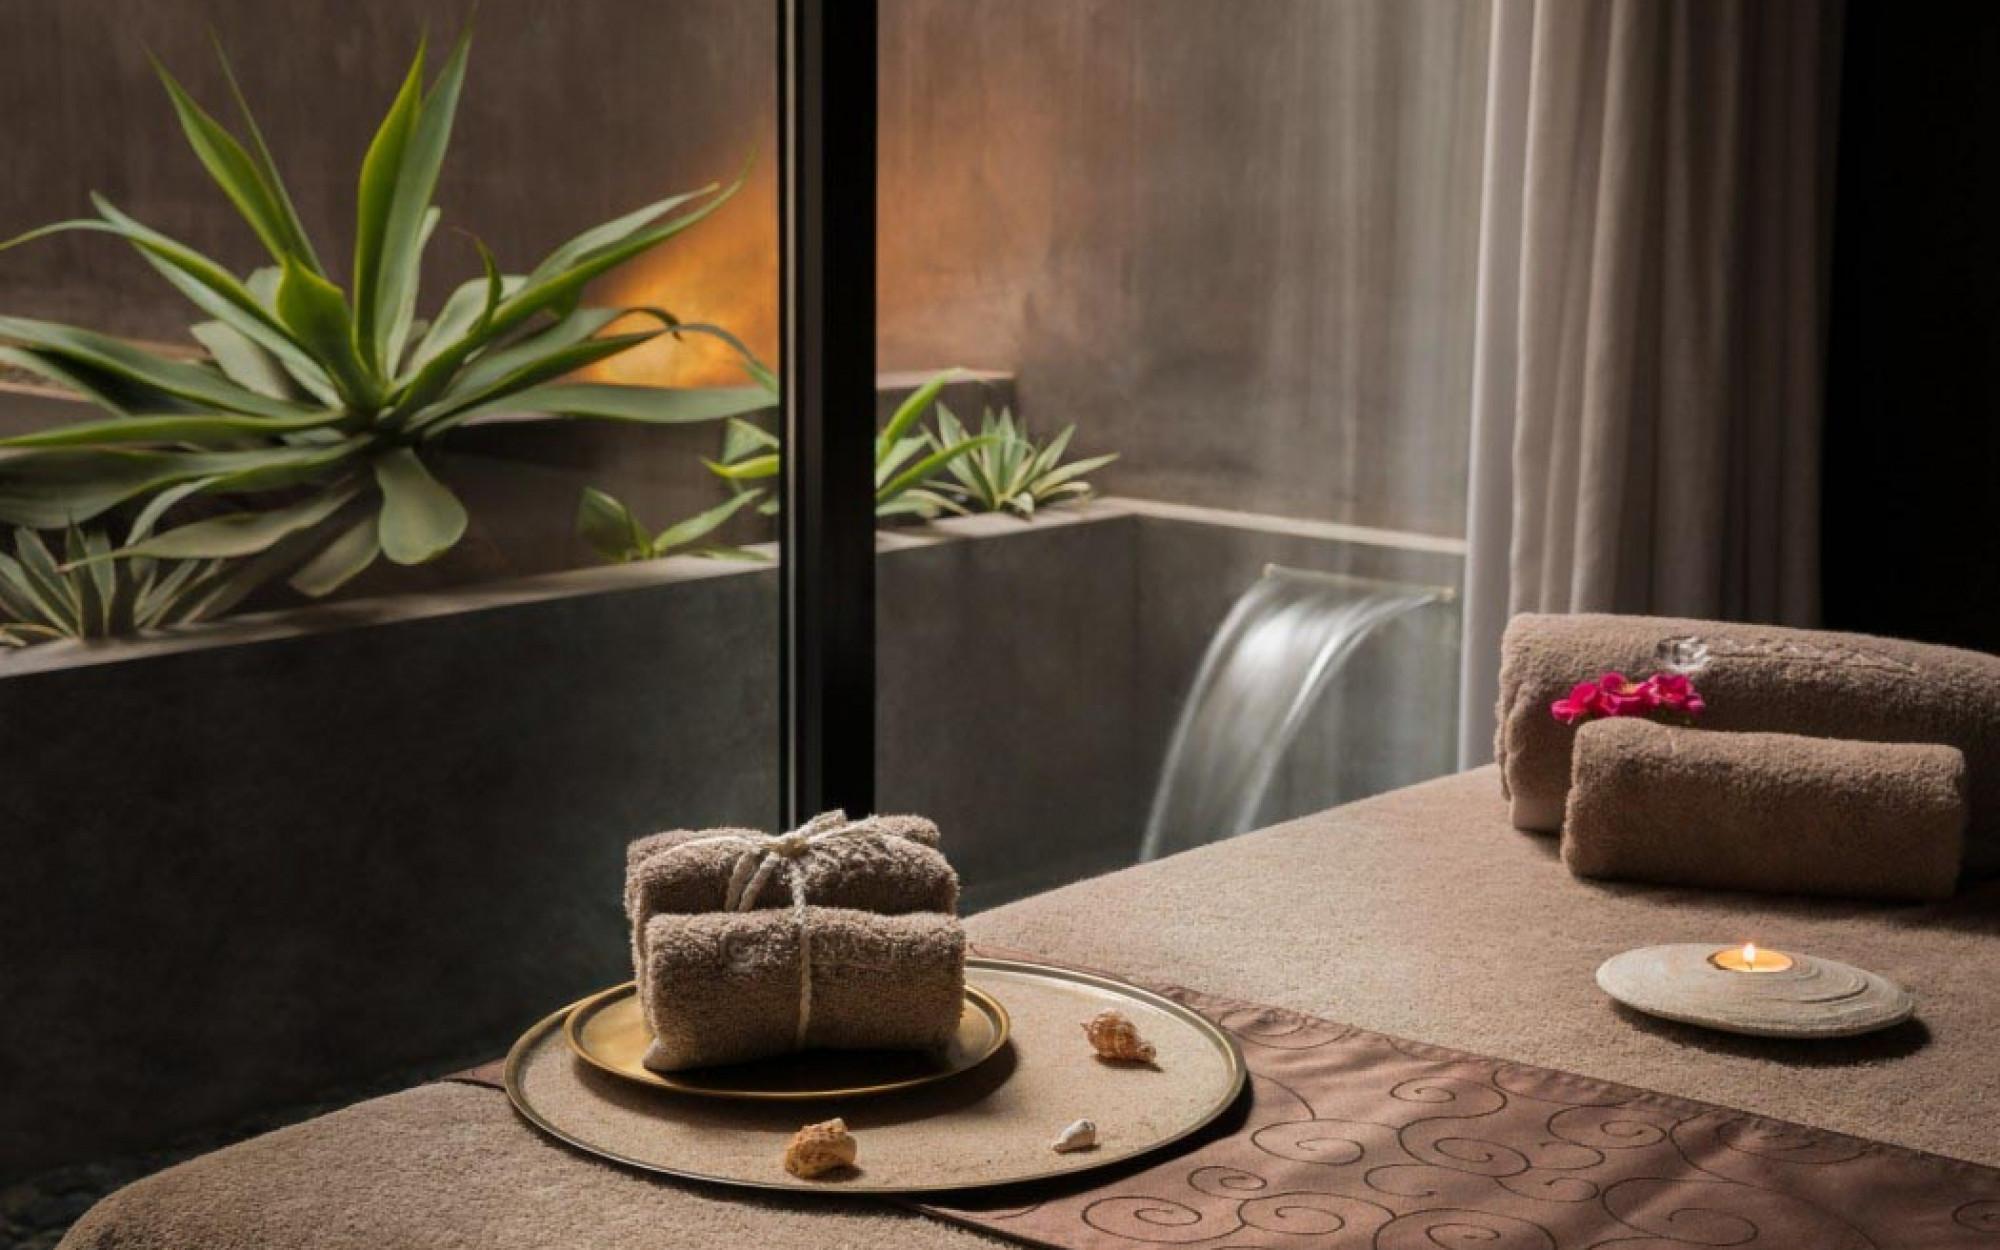 Claris Hotel Spa Barcelone 5 Grand Luxe Site Officiel